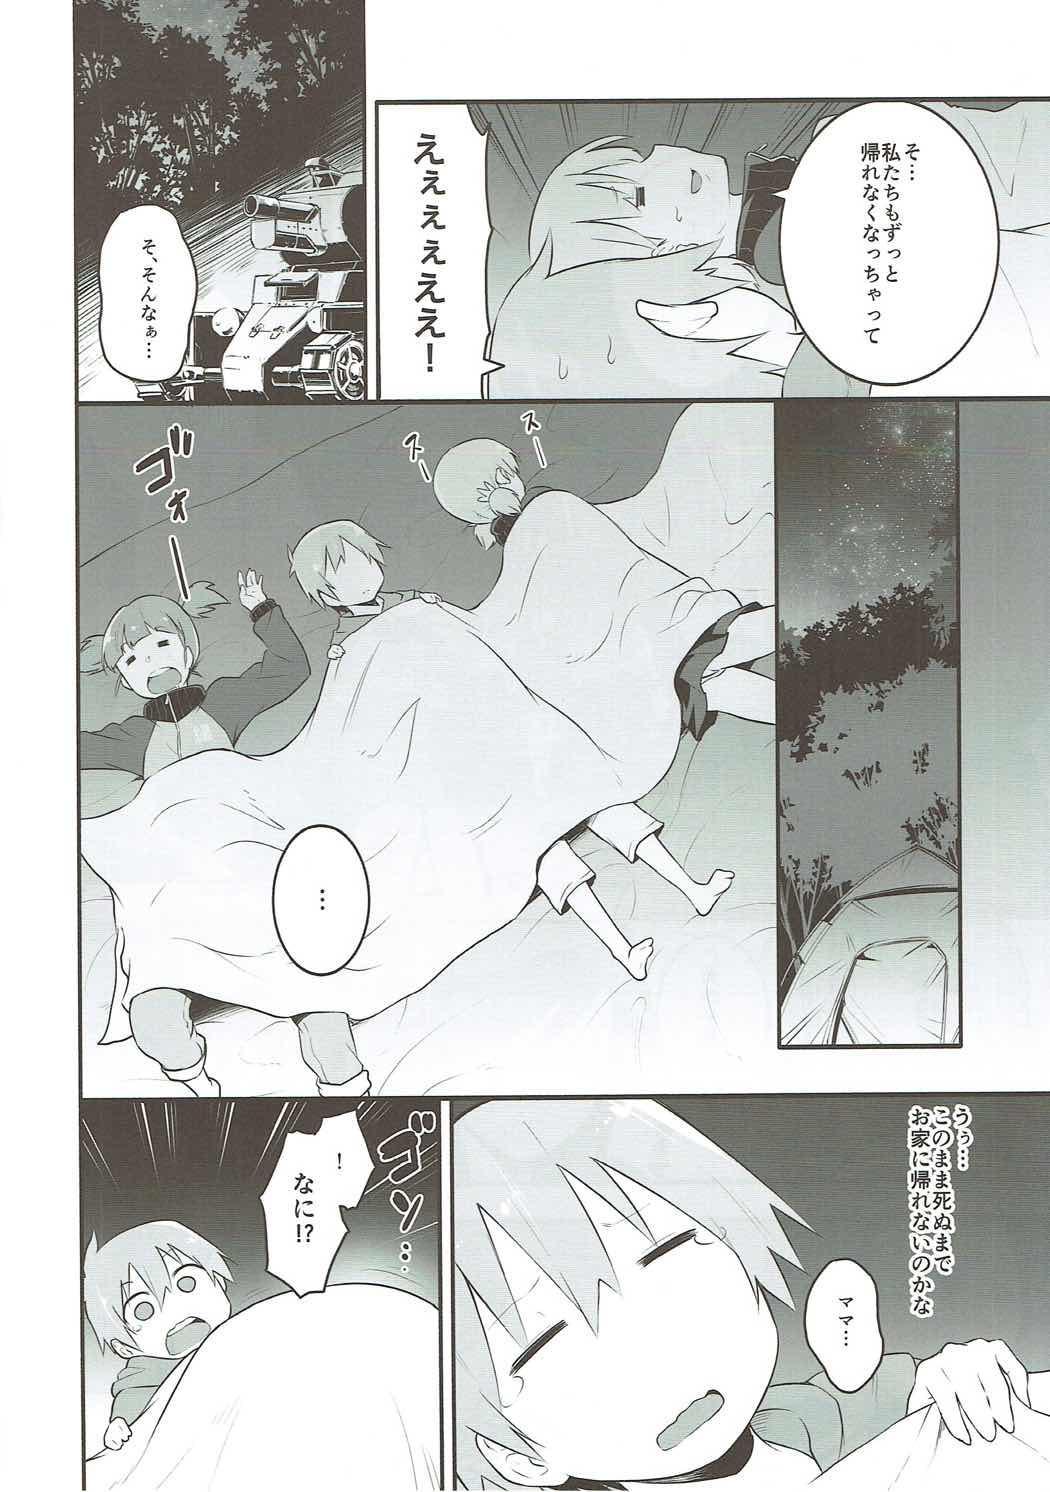 Mika-san to Ichaicha Mujintou Sakusen 2